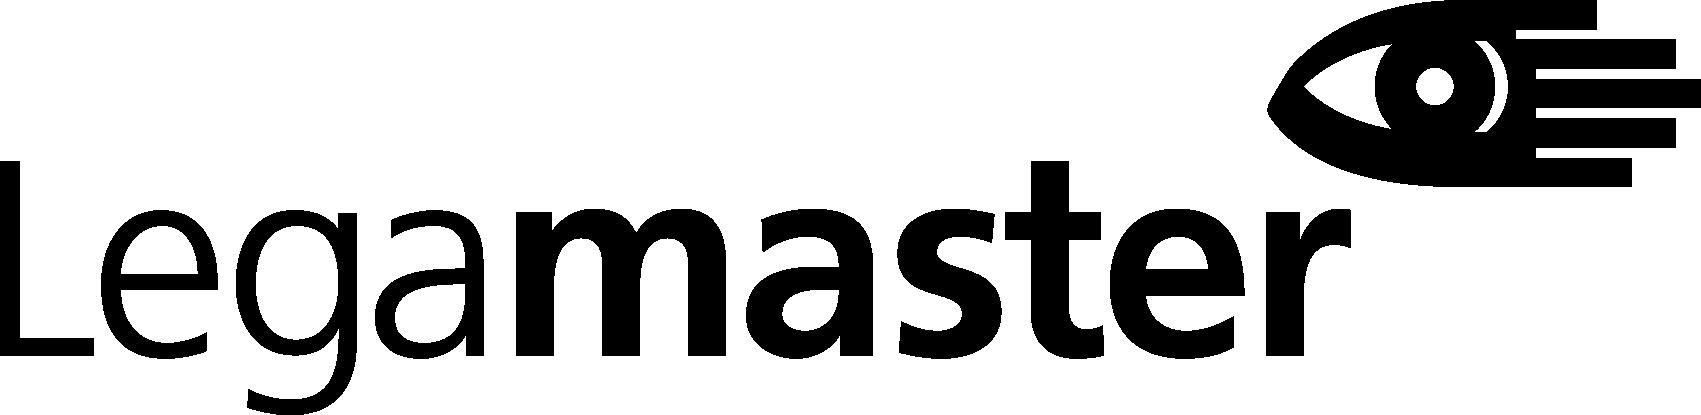 Legamaster Logo- FlatFrog Display Partner